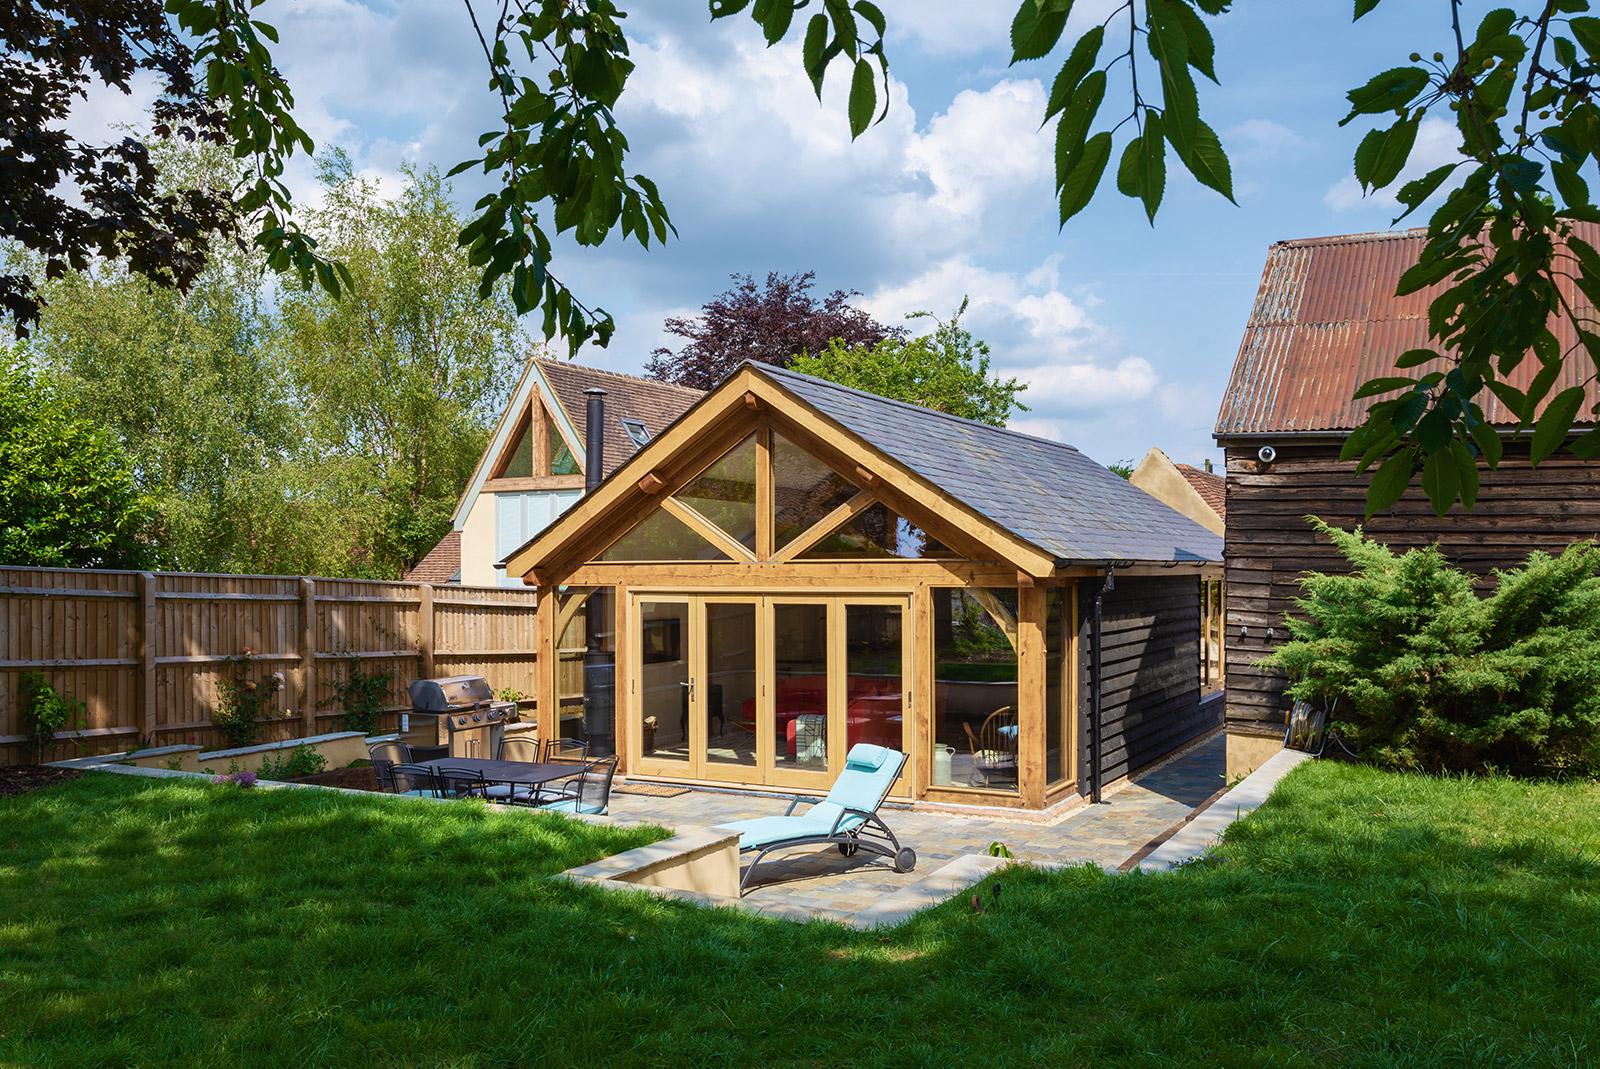 Hollybush Cottage - Rear - After